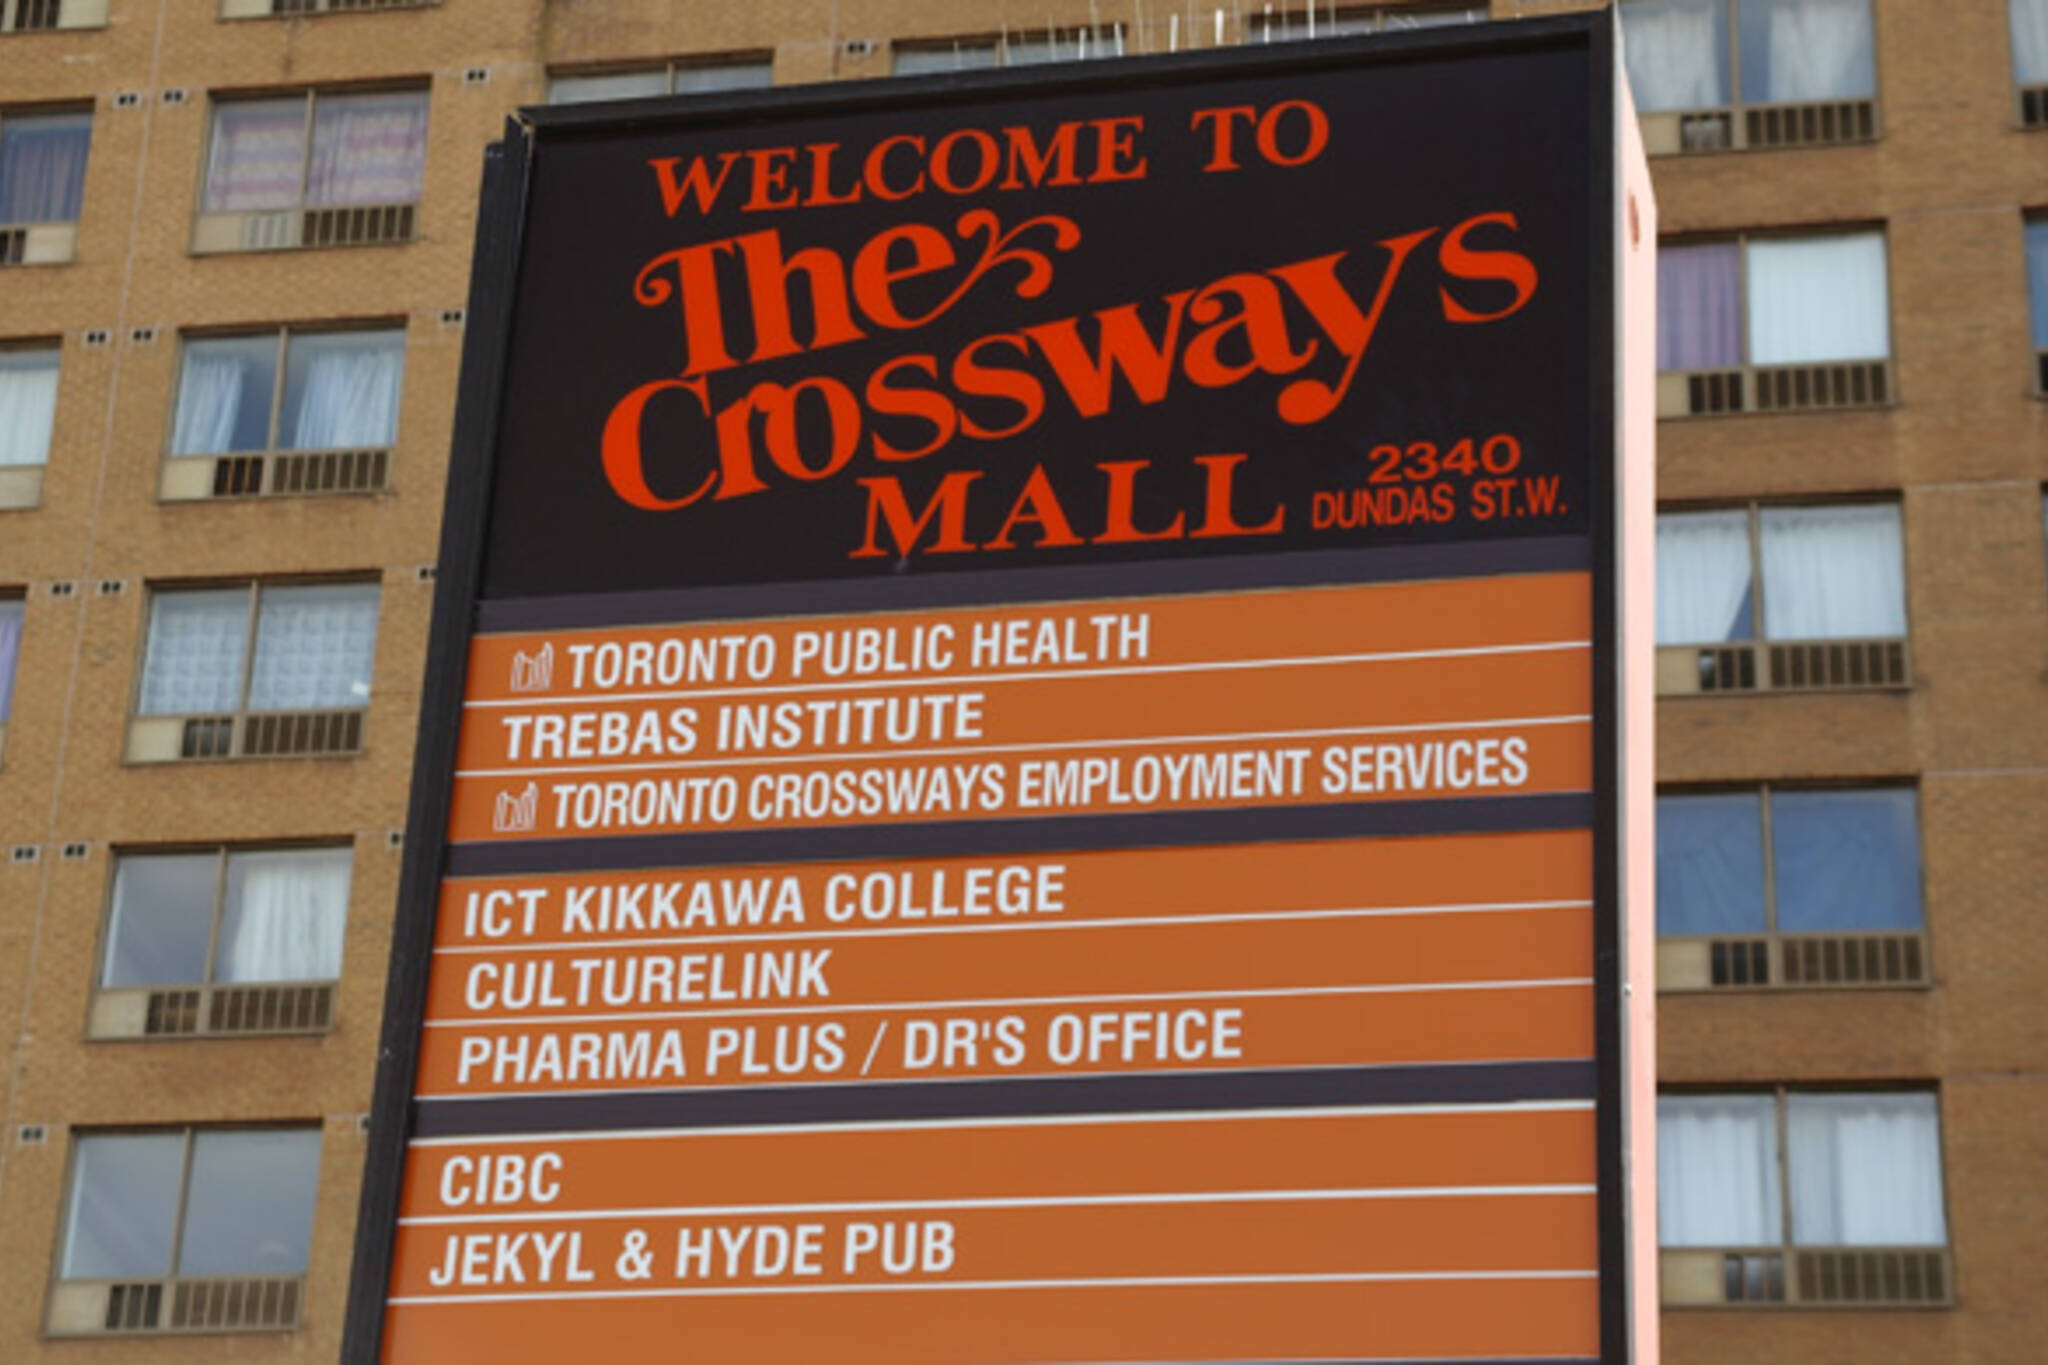 Crossways Mall Toronto